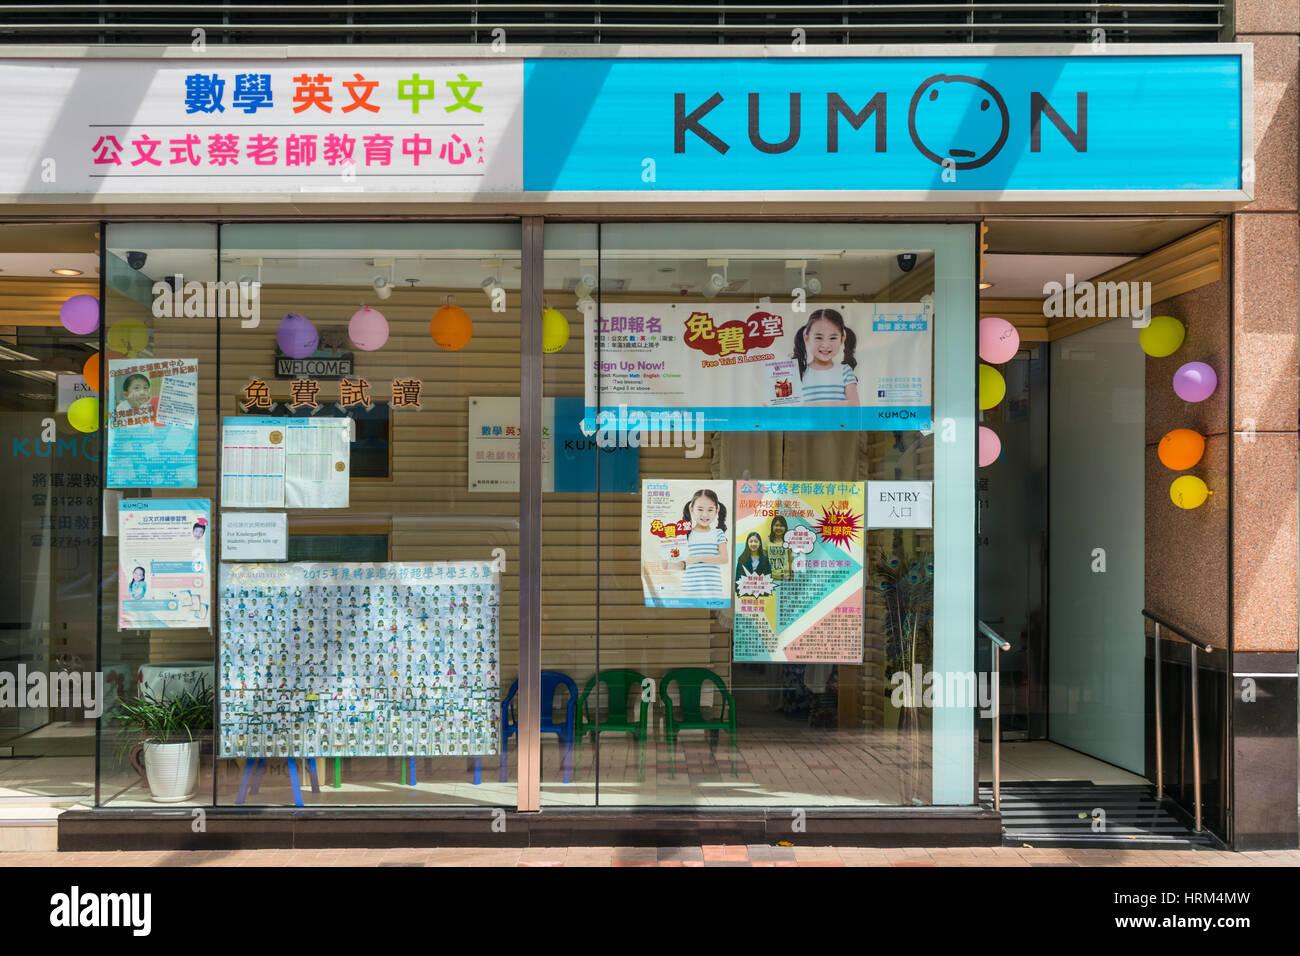 Kumon Stock Photos & Kumon Stock Images - Alamy